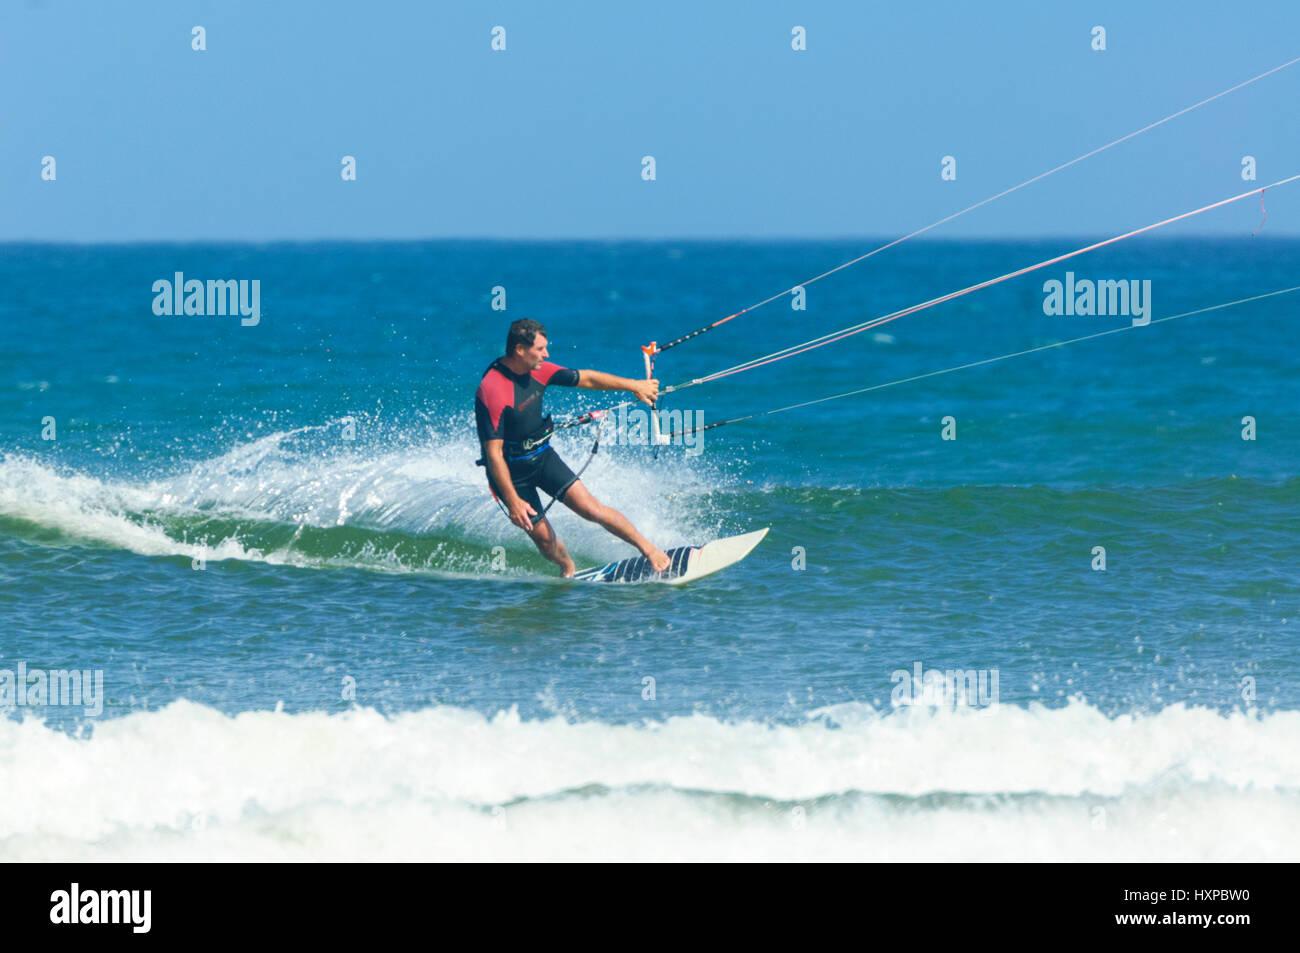 Kite surfer surfing at Seven Mile Beach, Gerroa, Illawarra Coast, New South Wales, NSW, Australia - Stock Image